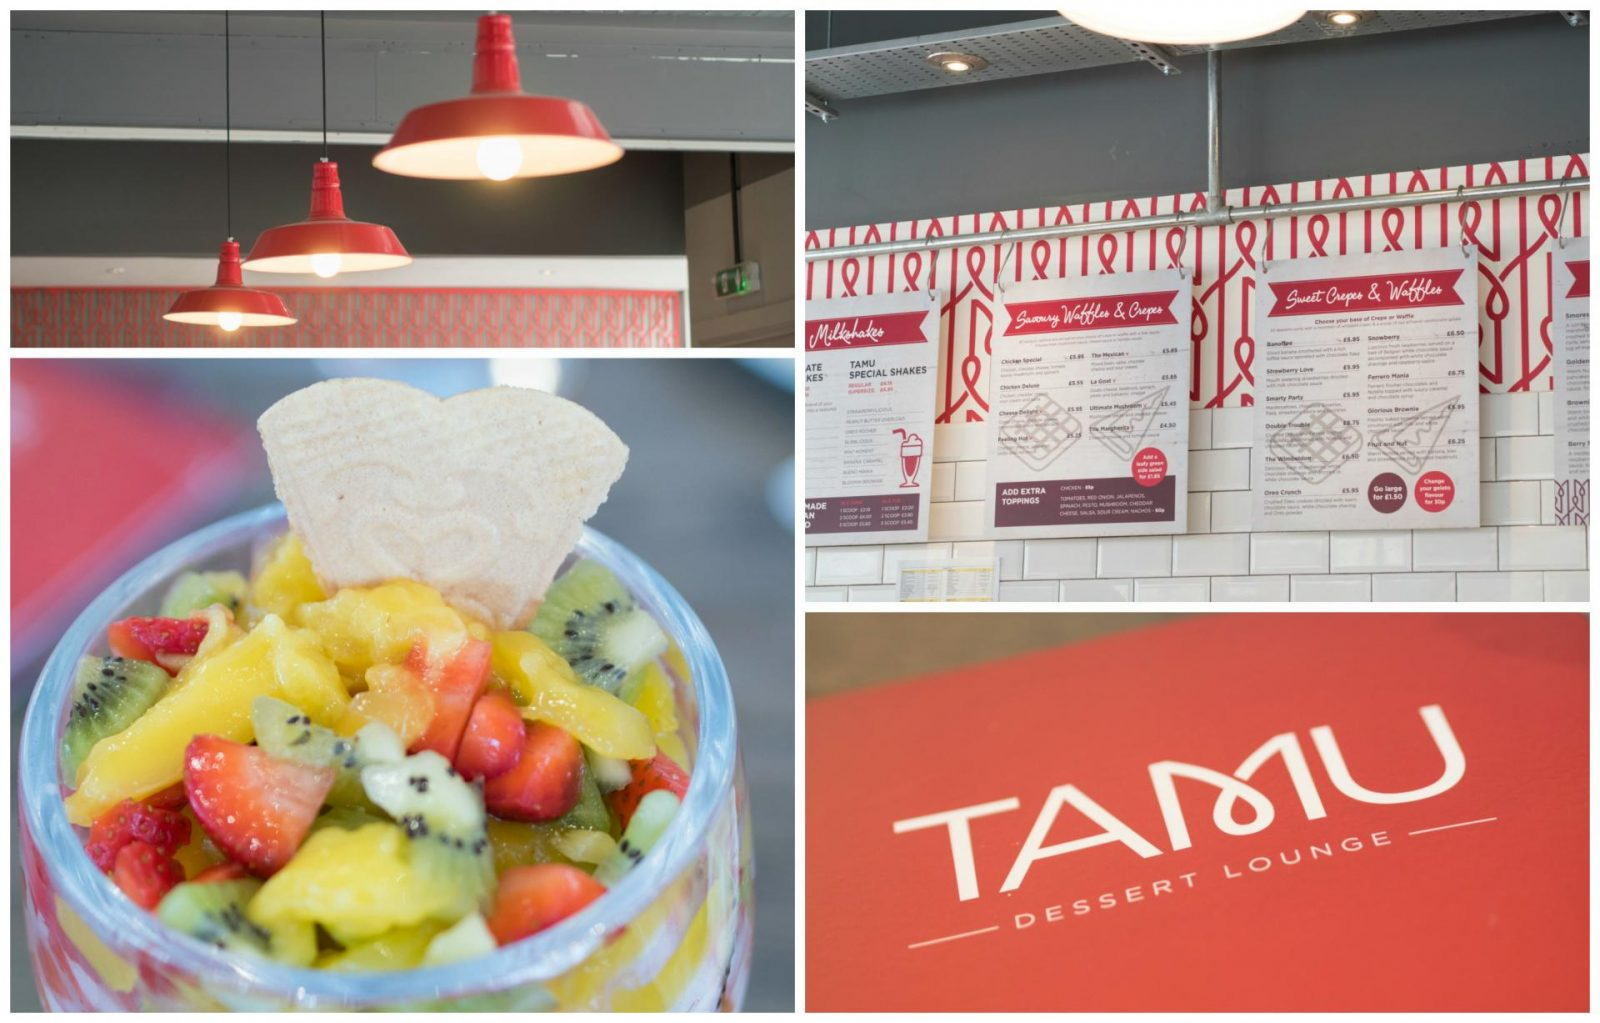 Handmade-Burger-Co-and-Tamu-Dessert Lounge